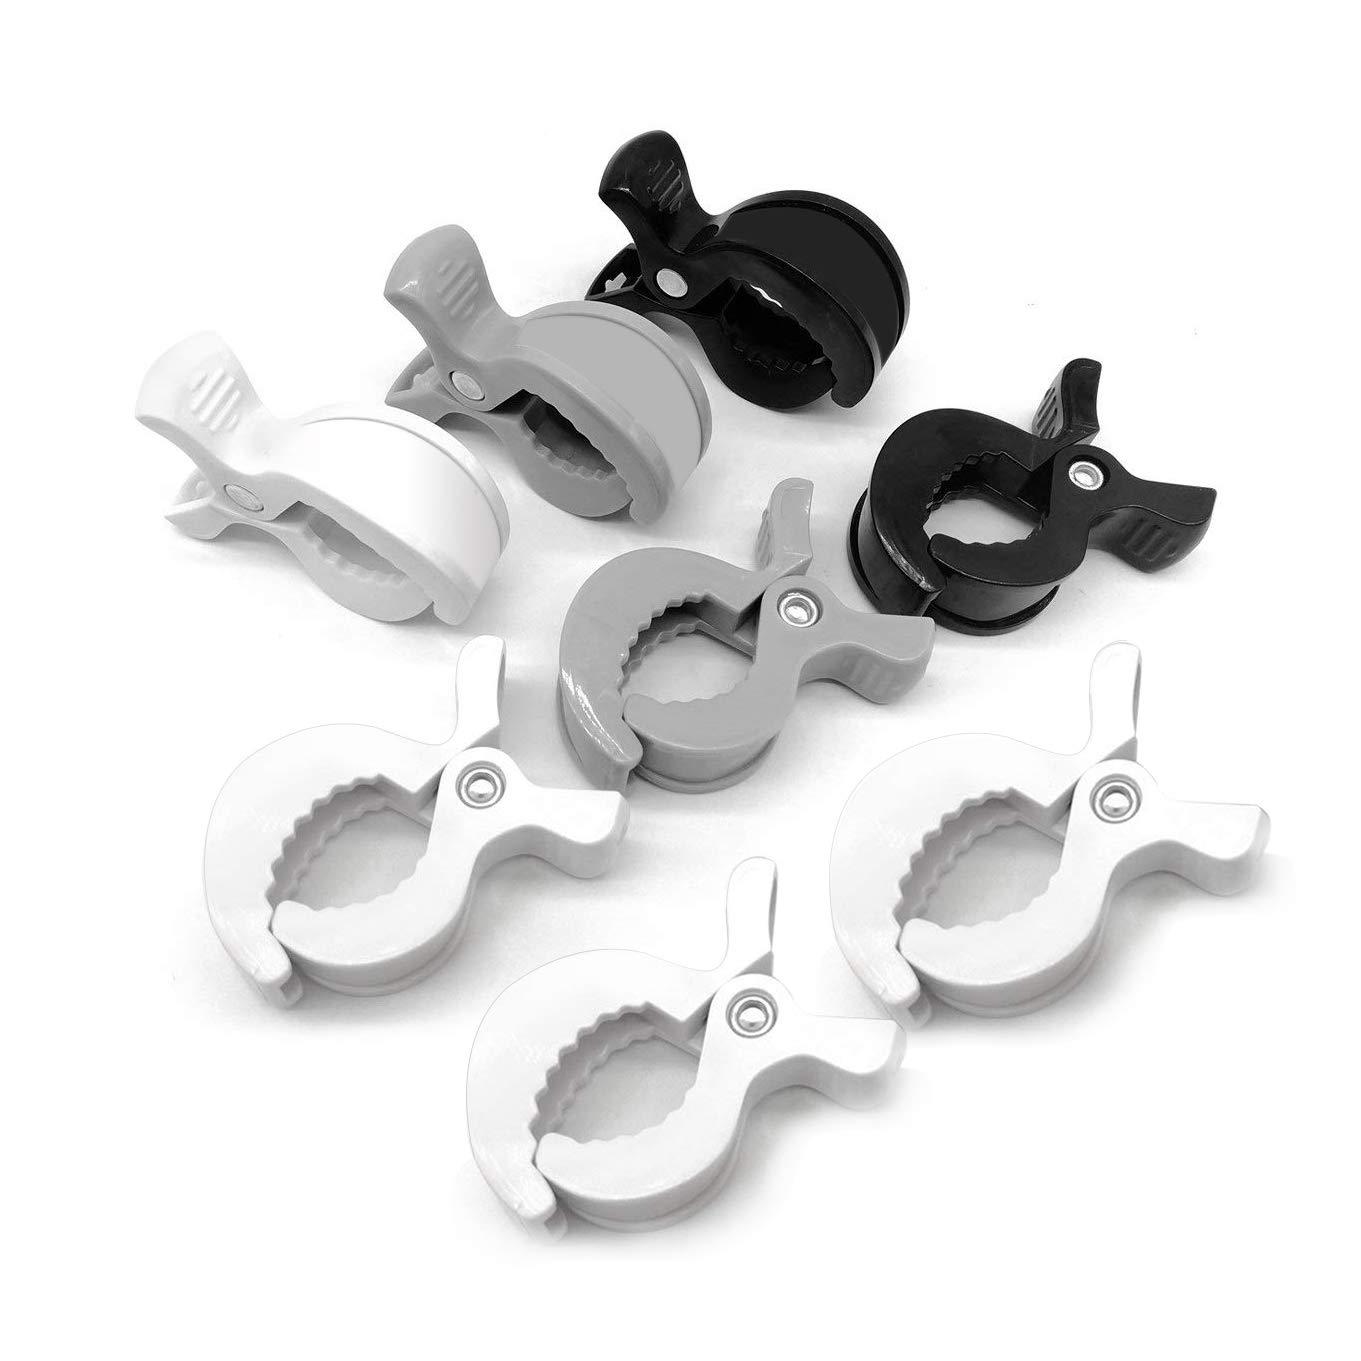 Luchild Stroller Hooks & Pram Pegs Clip Set Pram Hooks for Bags Universal Buggy Clips for Muslin and Toy (2 Buggy Hooks+ 4 Stroller Pegs)